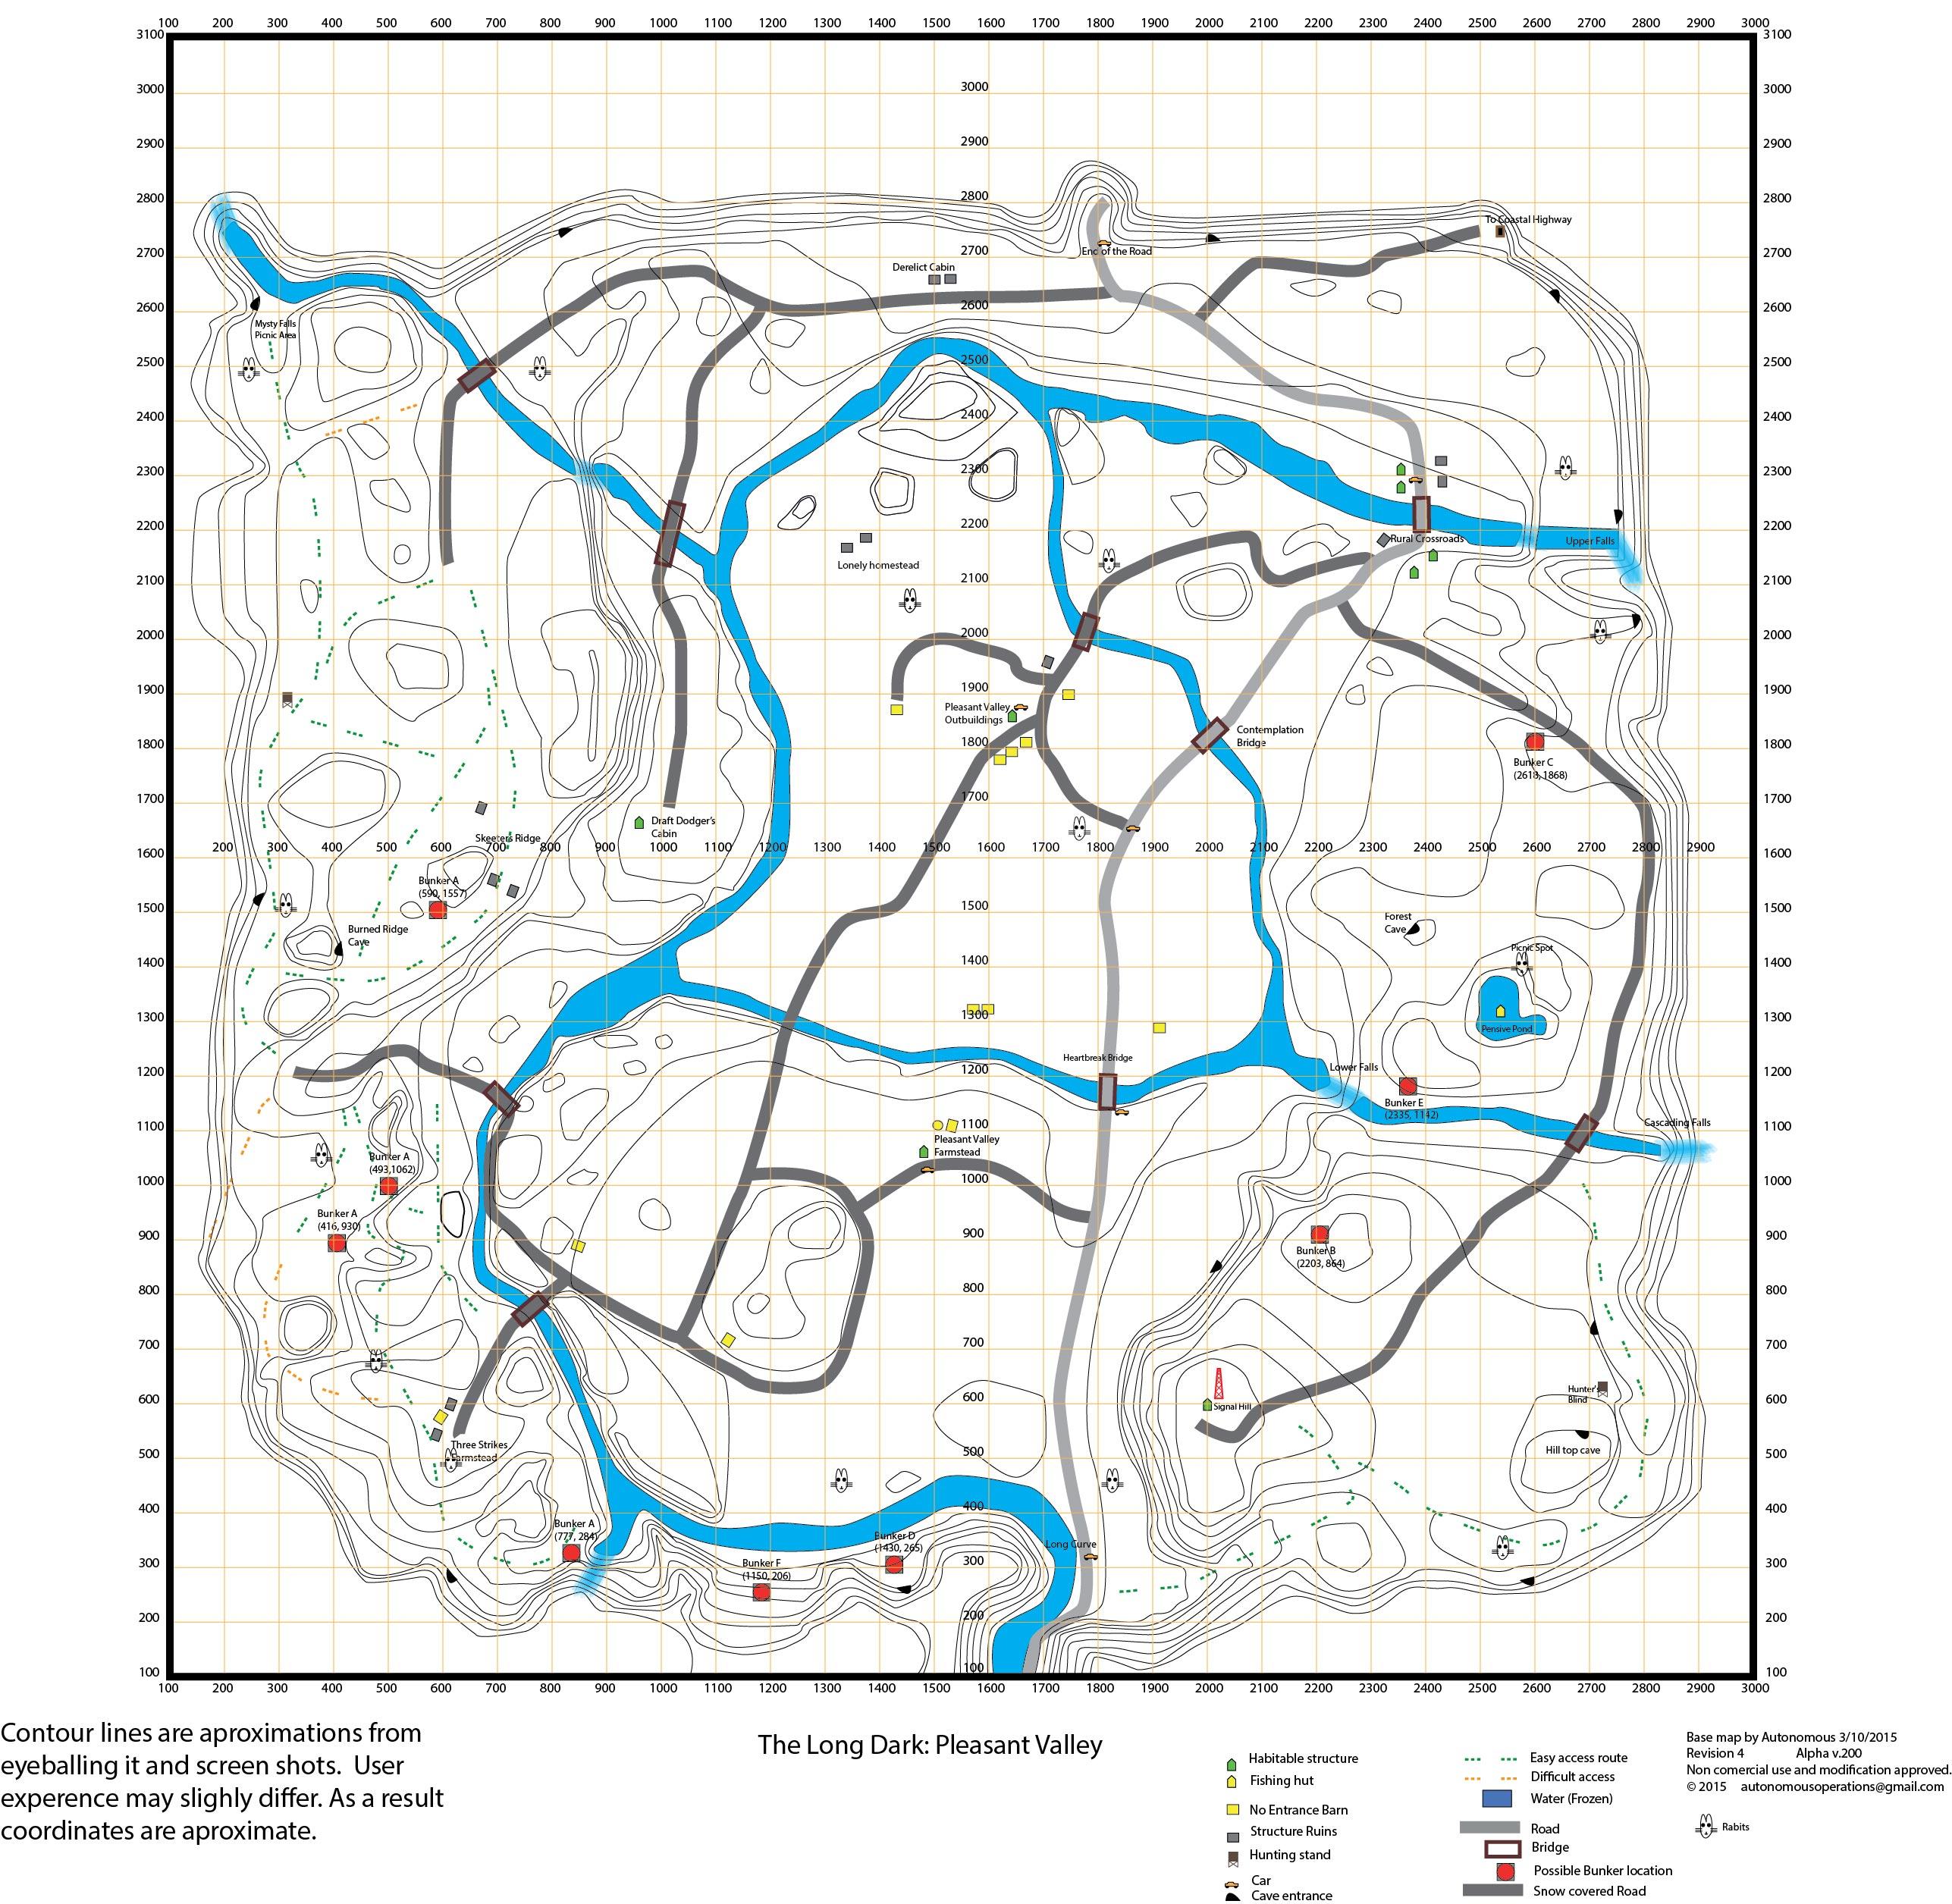 Worksheet. Steam Community  Guide  The Long Dark Topo Maps wBunker locations